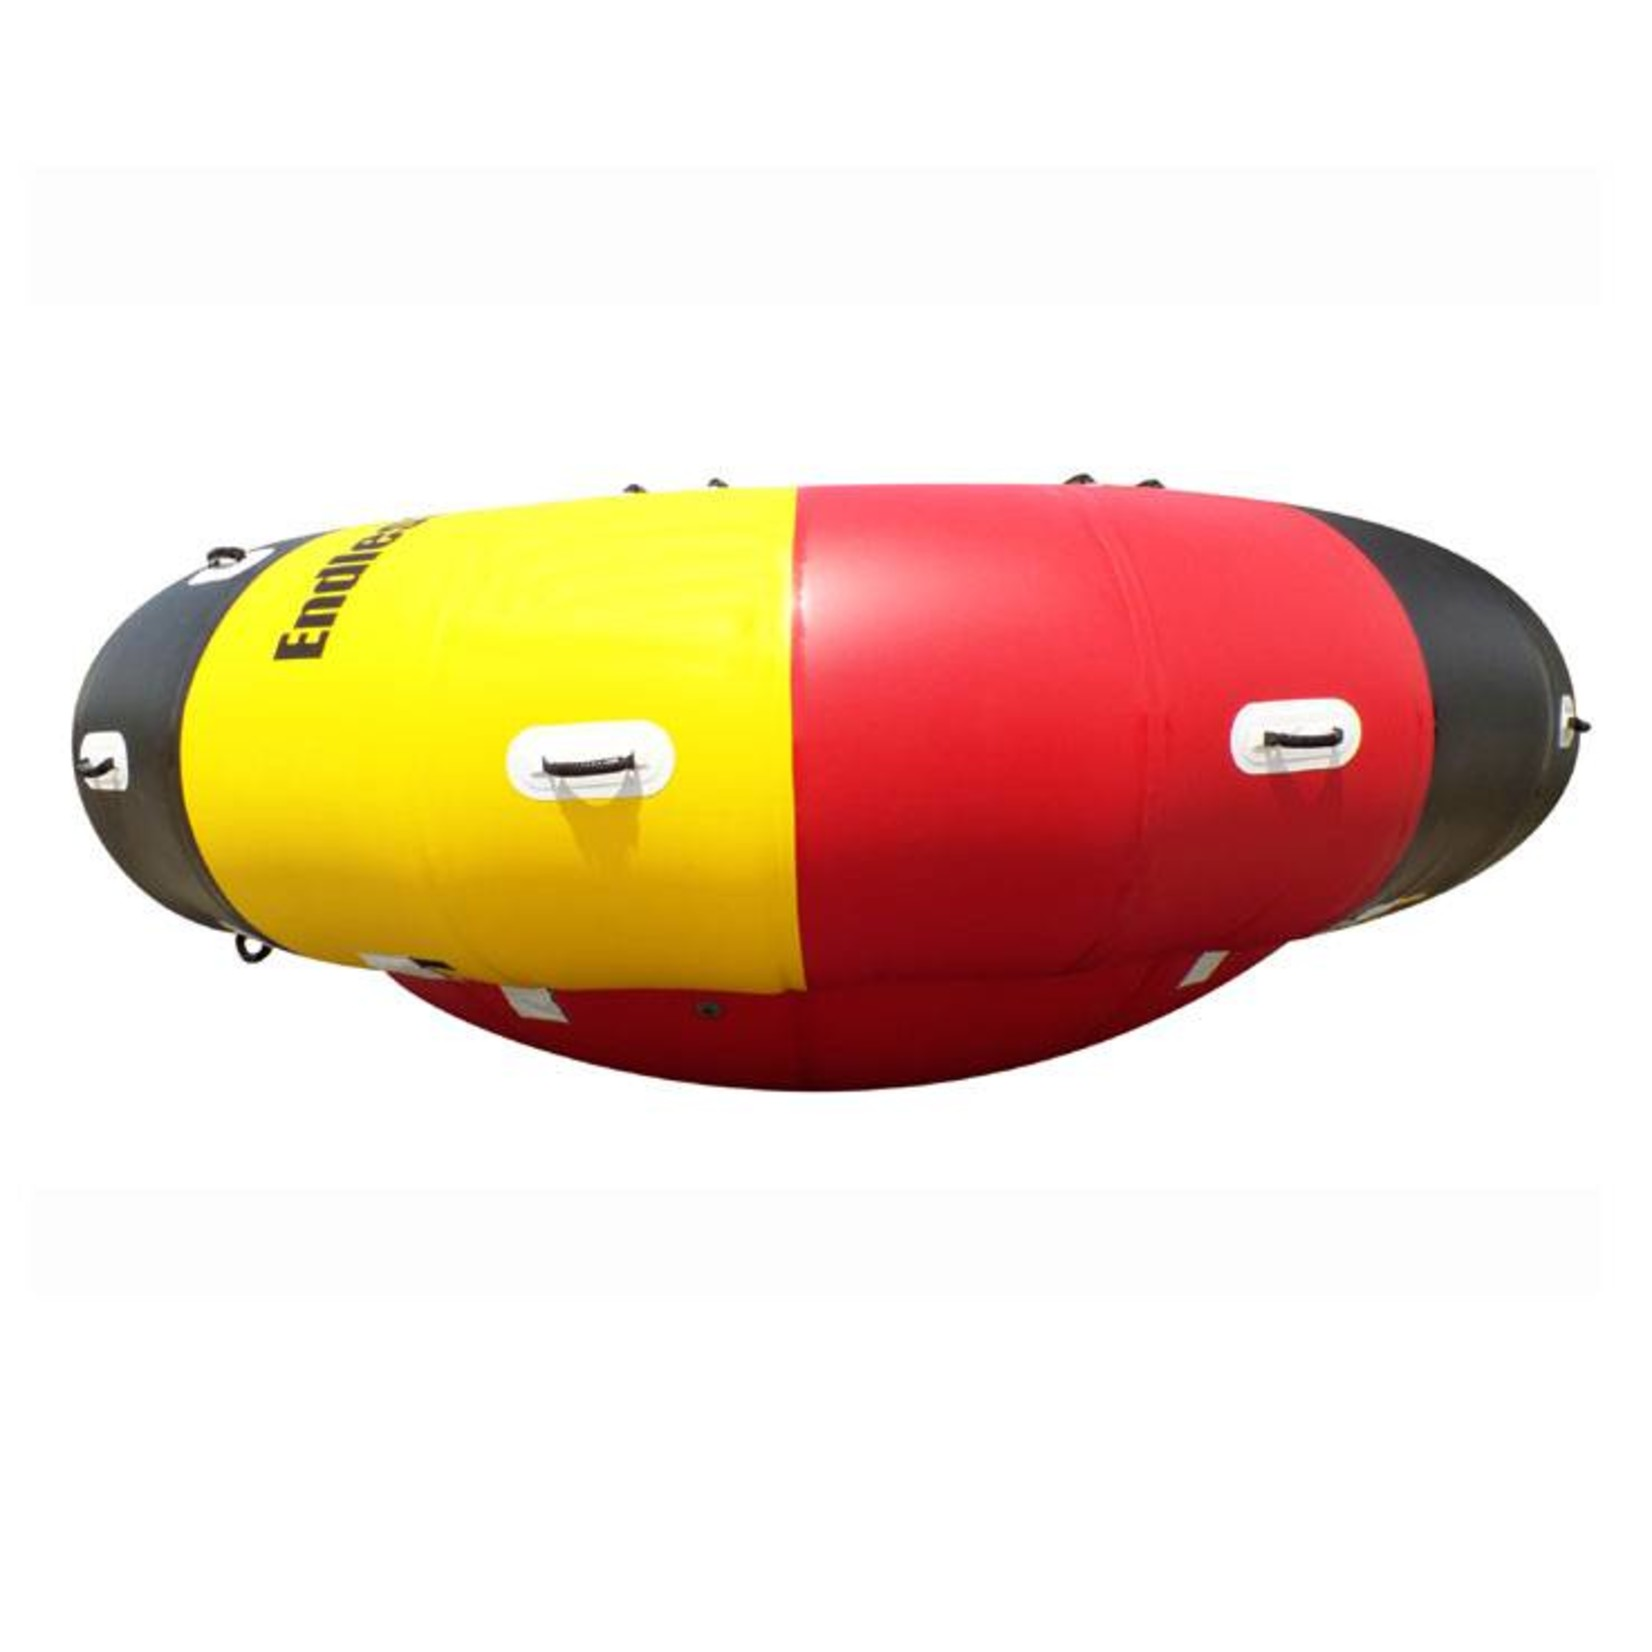 Spinera Professional Endless Ride 2 - Rotating Tube